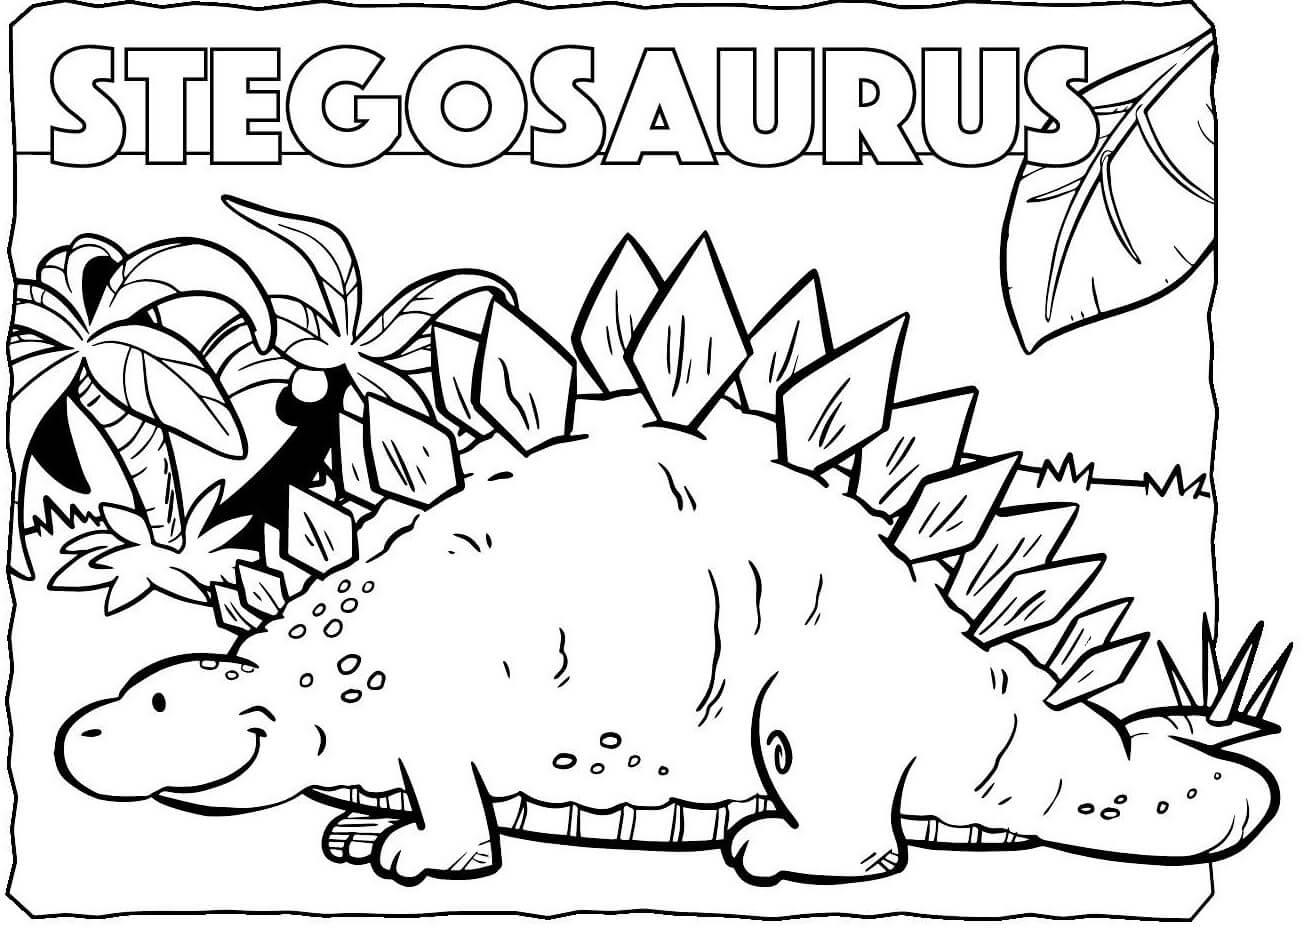 Funny Stegosaurus